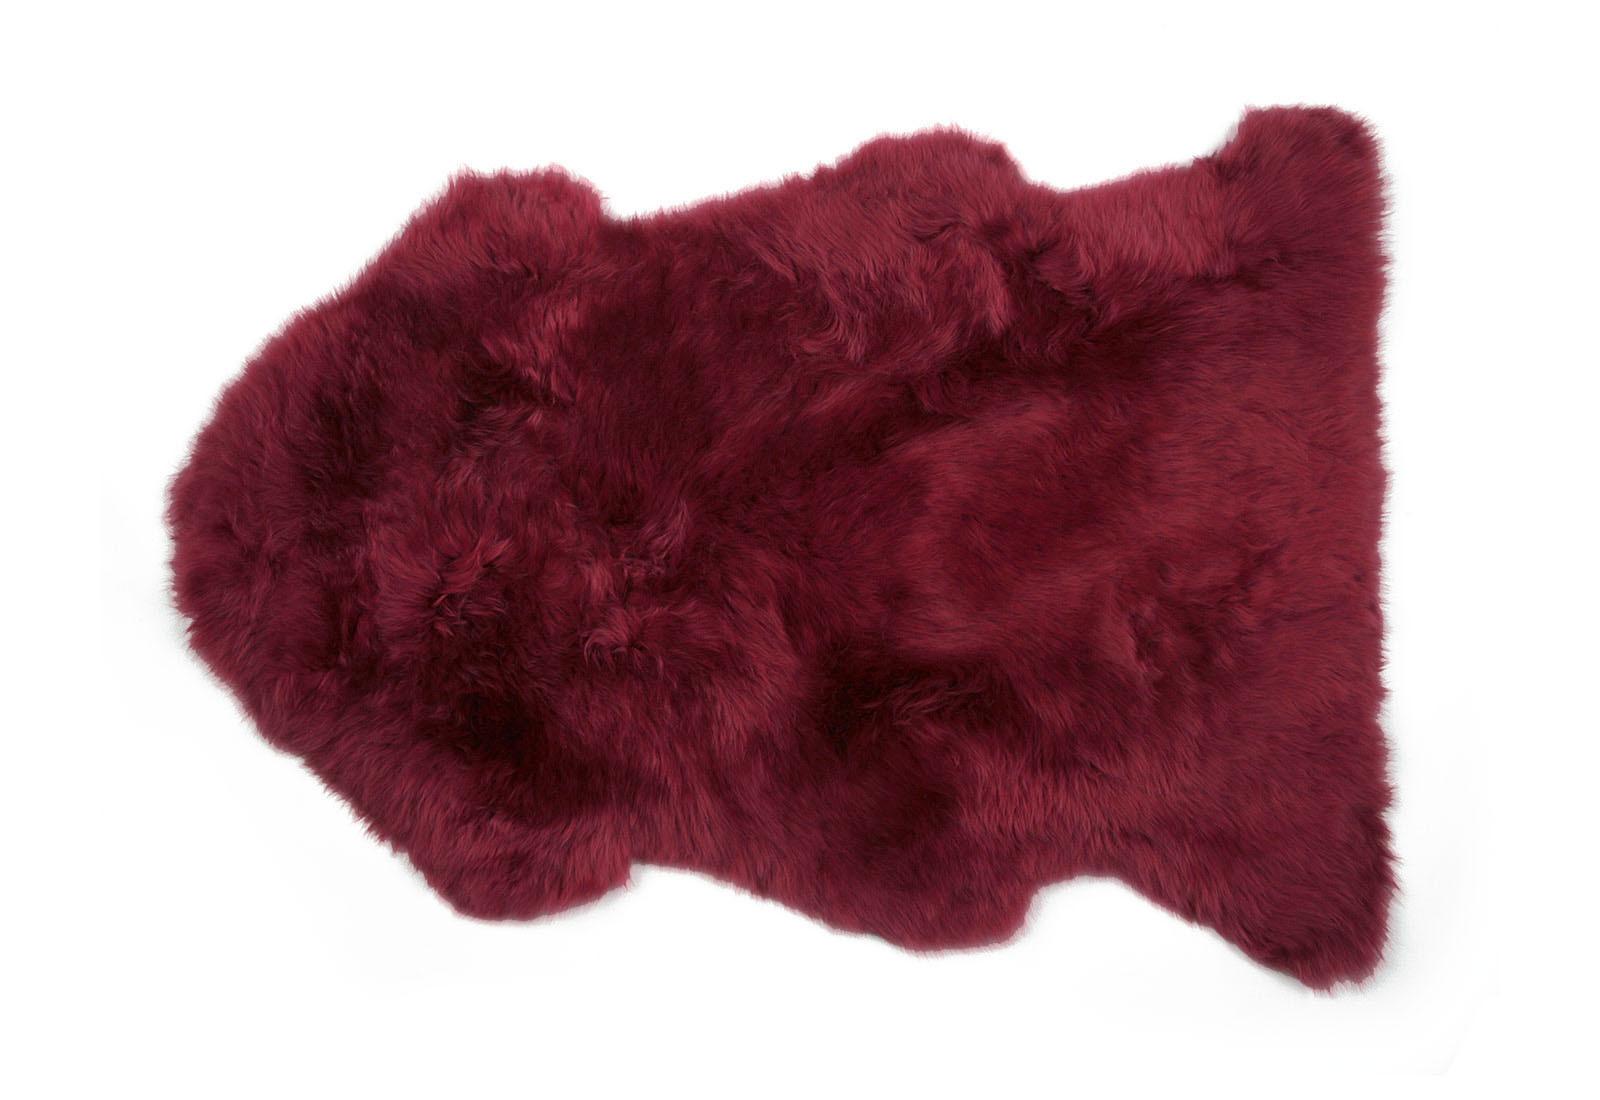 Raspberry Red Sheepskin Rug